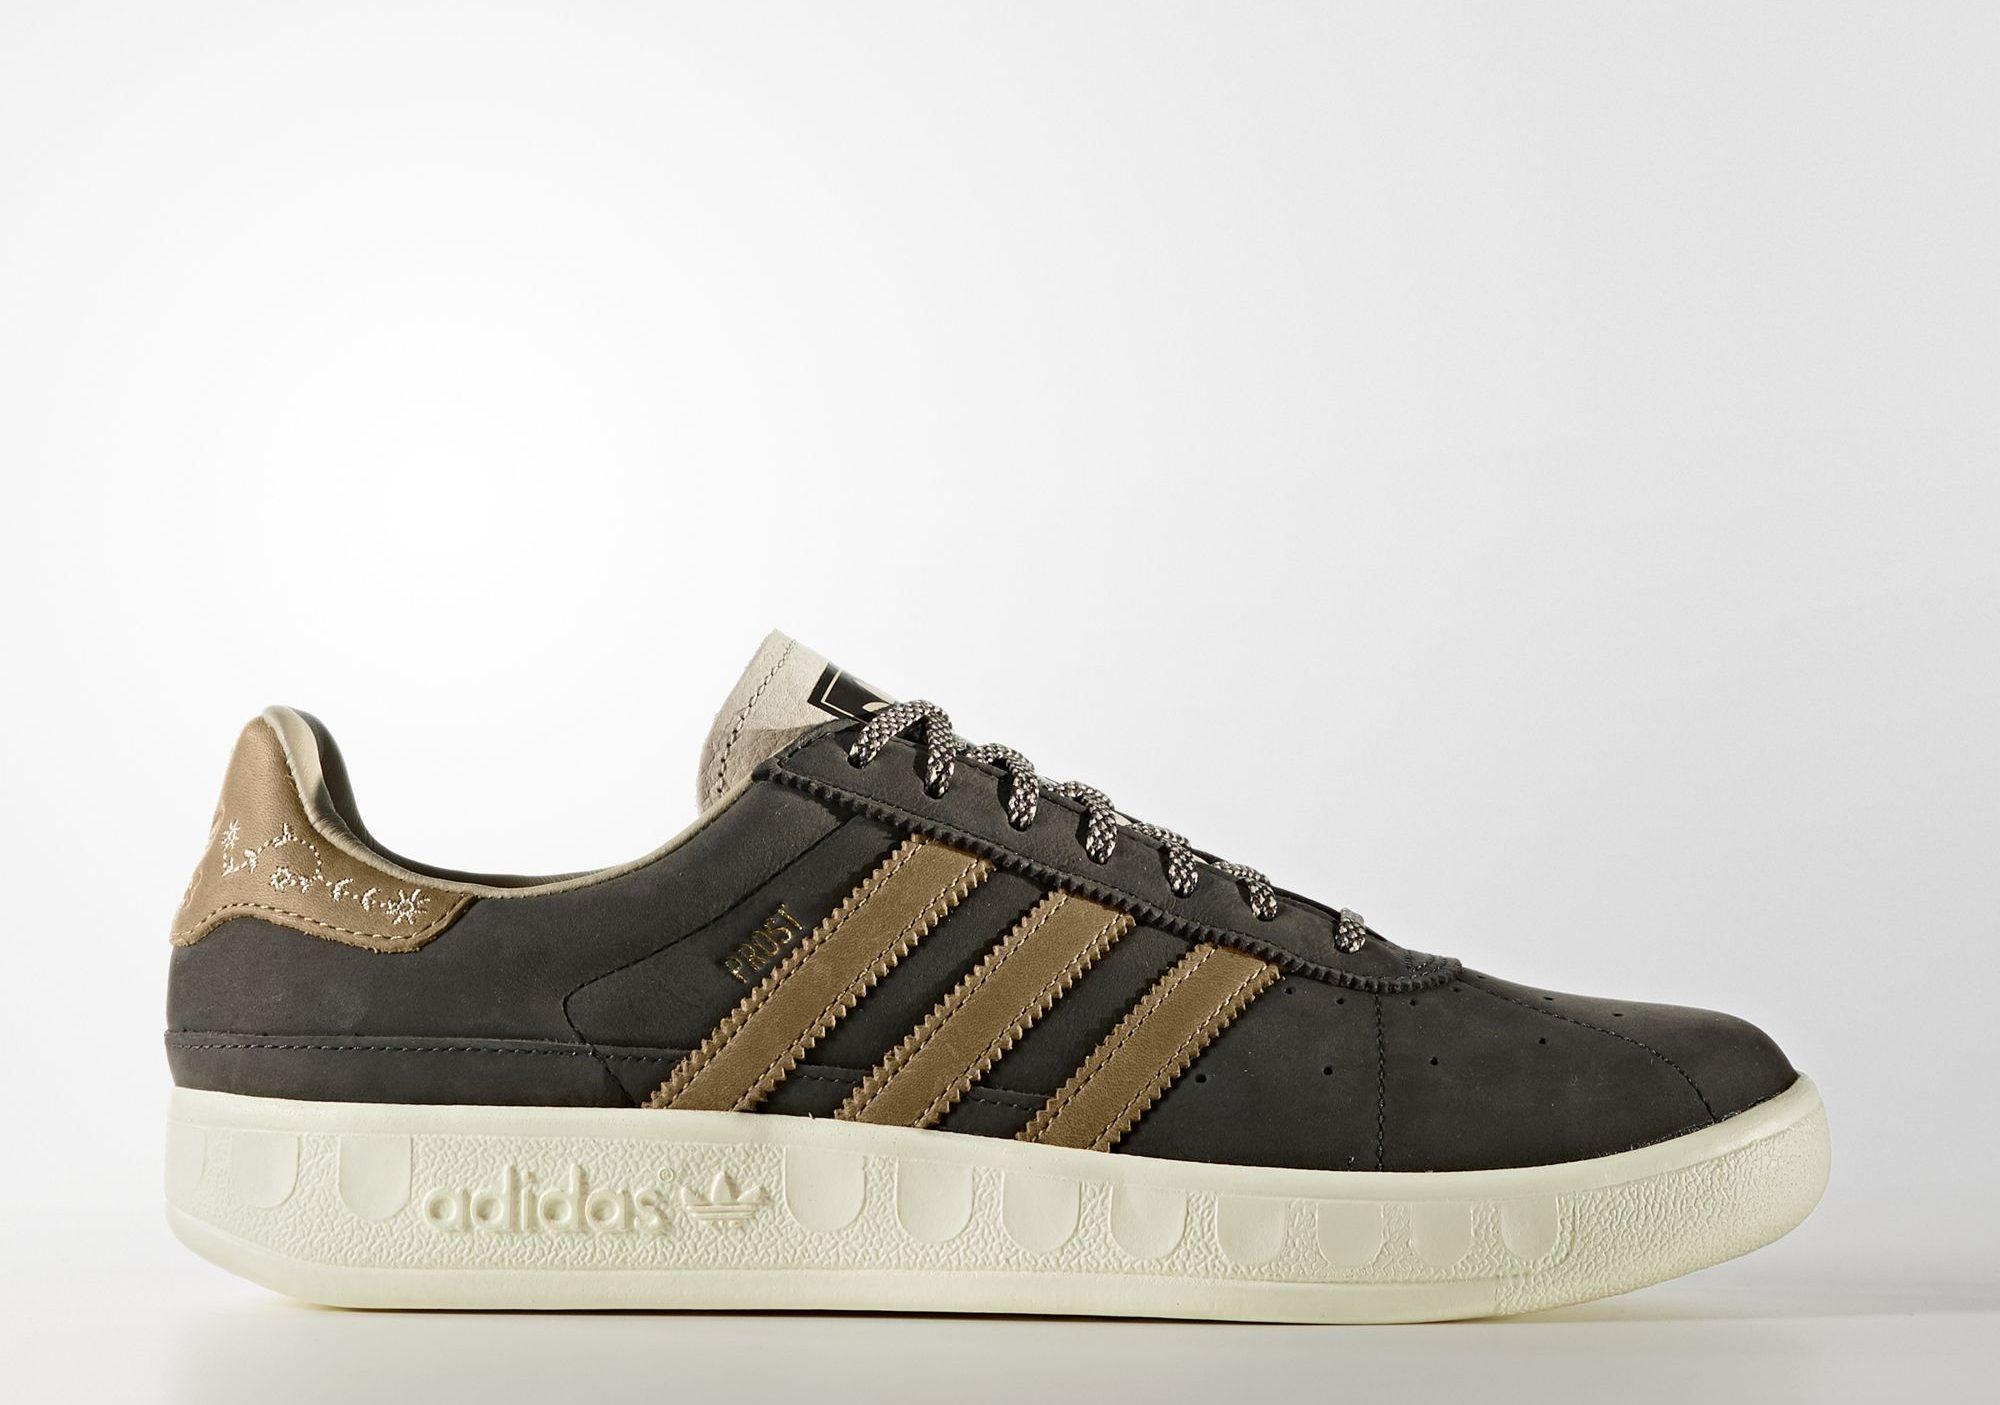 Canoa Mentalidad Árbol  Adidas releases £160 beer-repellent shoes